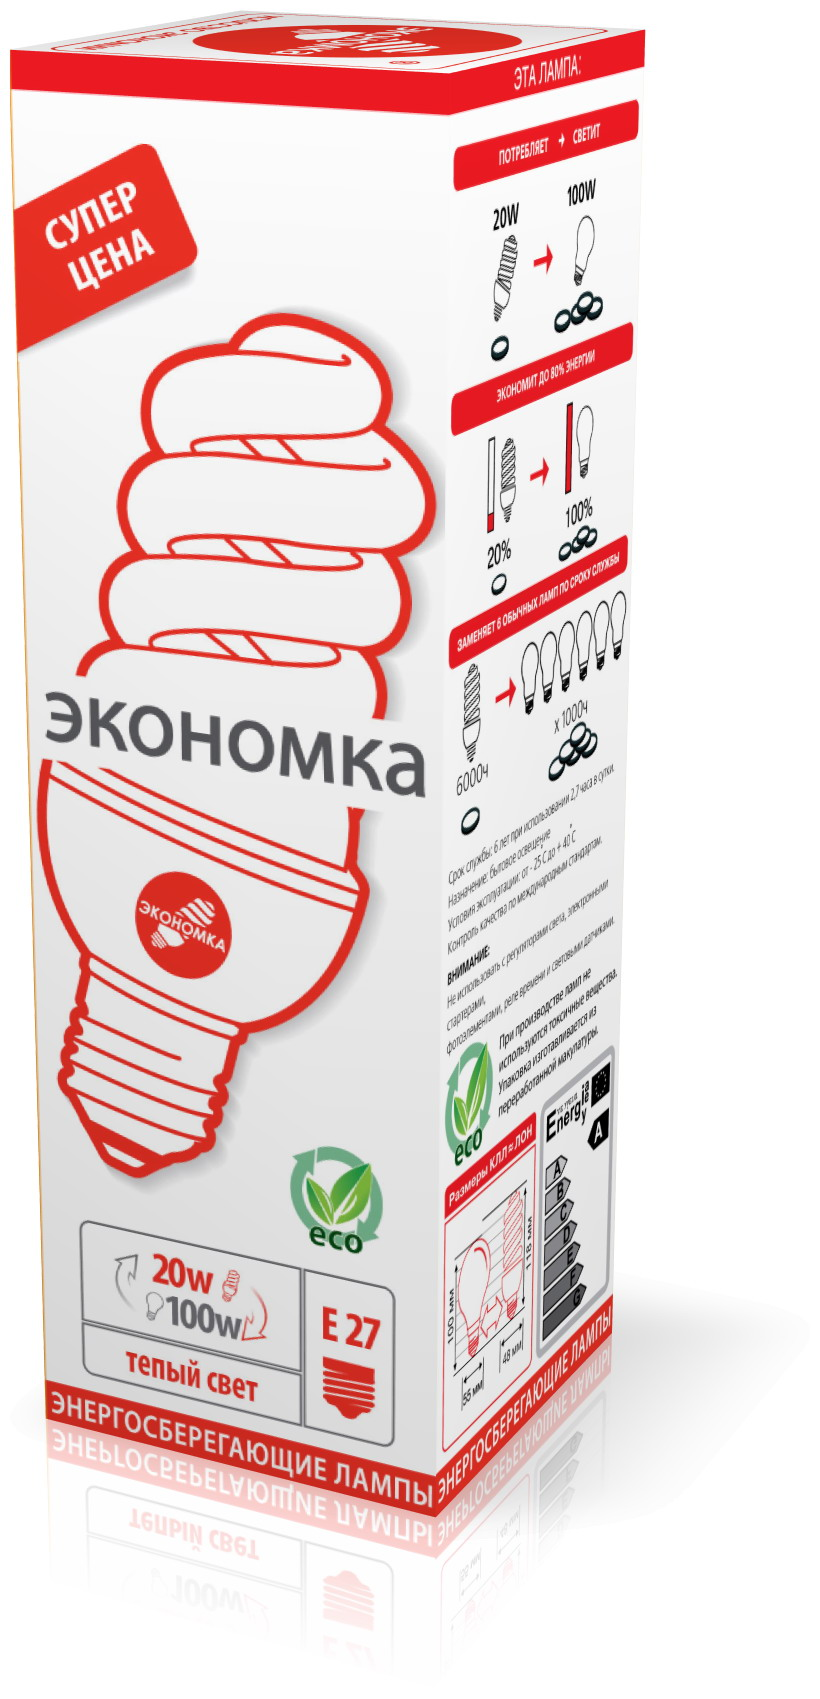 Лампа энергосберегающая ЭКОНОМКА 158710 elektrostandard лампа энергосберегающая компакт винт теплый свет цоколь е27 15w